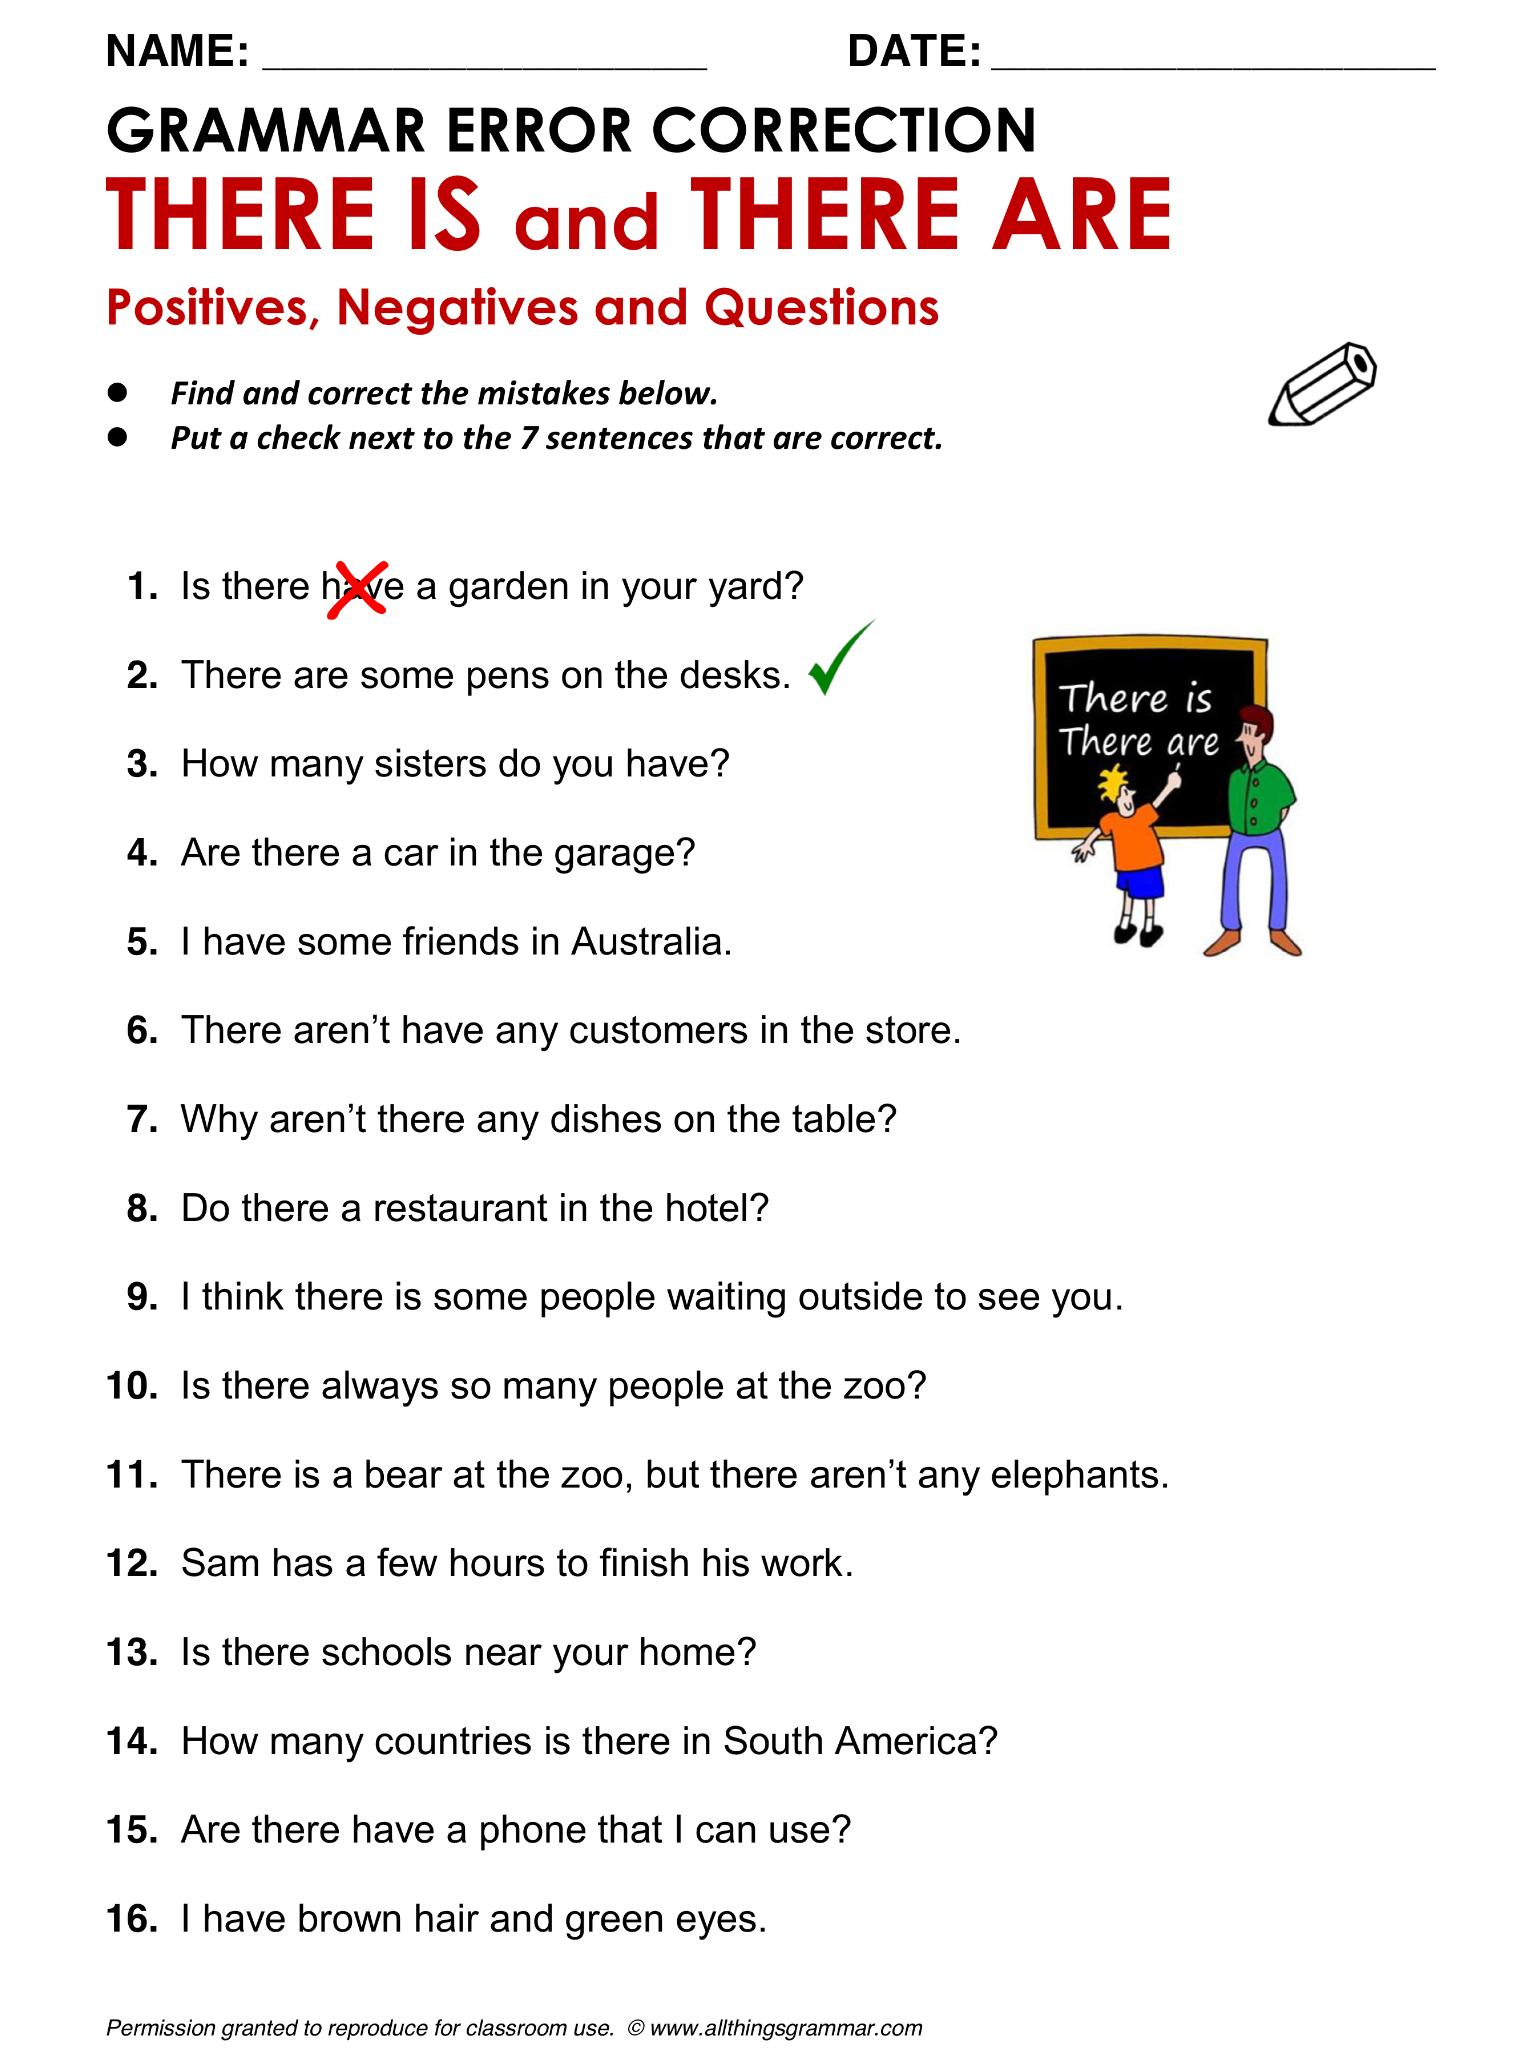 worksheet Grammar Correction Worksheets 78 best images about angol on pinterest printable worksheets student centered resources and esl